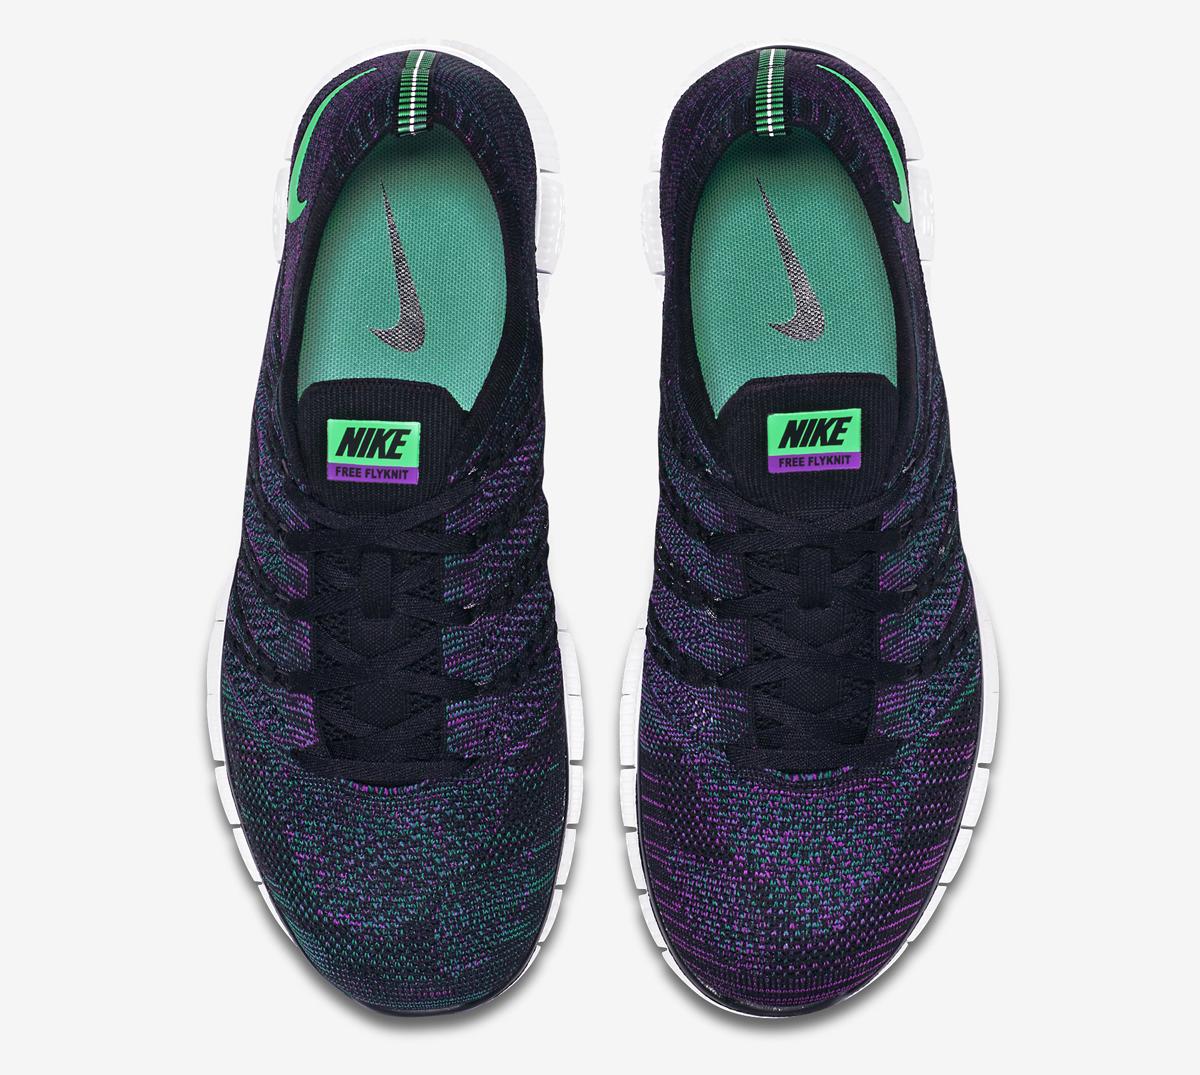 Nike Free Flyknit NSW Color  Black Green Glow-Radiant Emerald-Vivid Purple  Style    599459-003 859c3e064